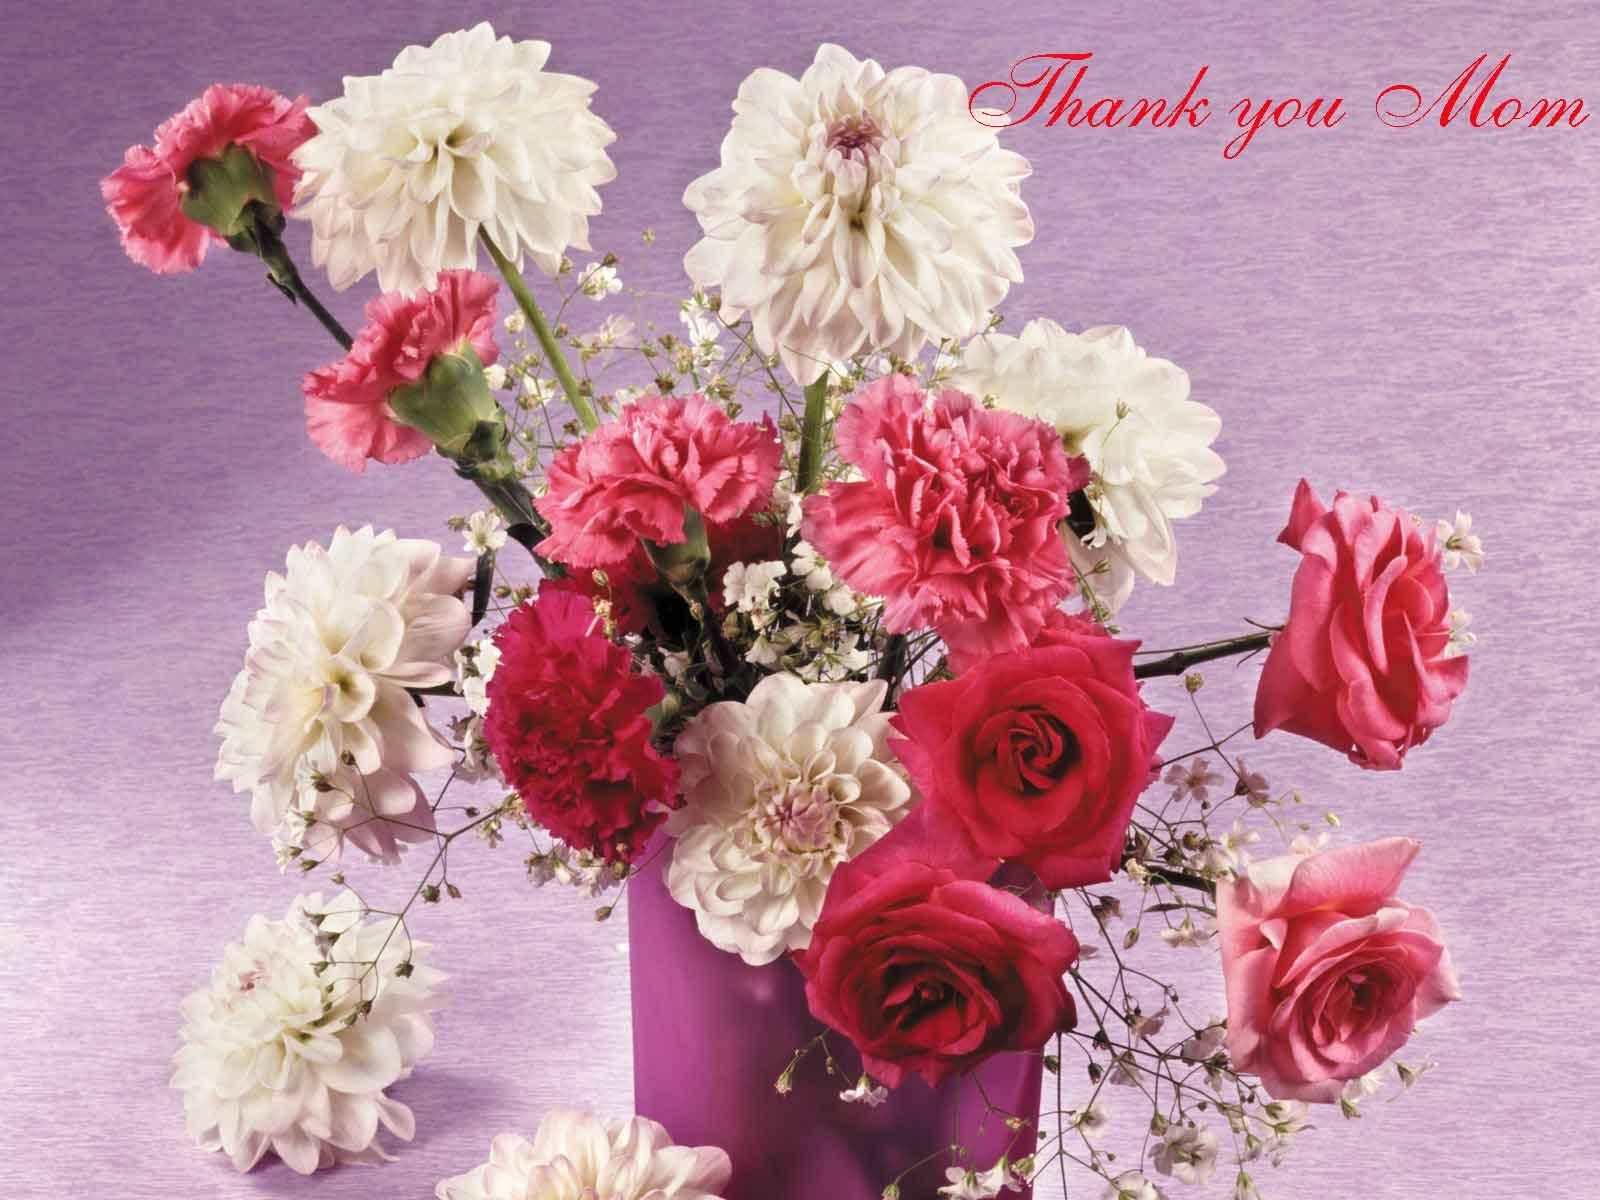 http://4.bp.blogspot.com/-fdgdy3dOjl8/T5i9rXvA4pI/AAAAAAAADaY/hI-vf9KWyP0/s1600/Thank-You-Mom-Mothers-Day-Wallpaper.jpg